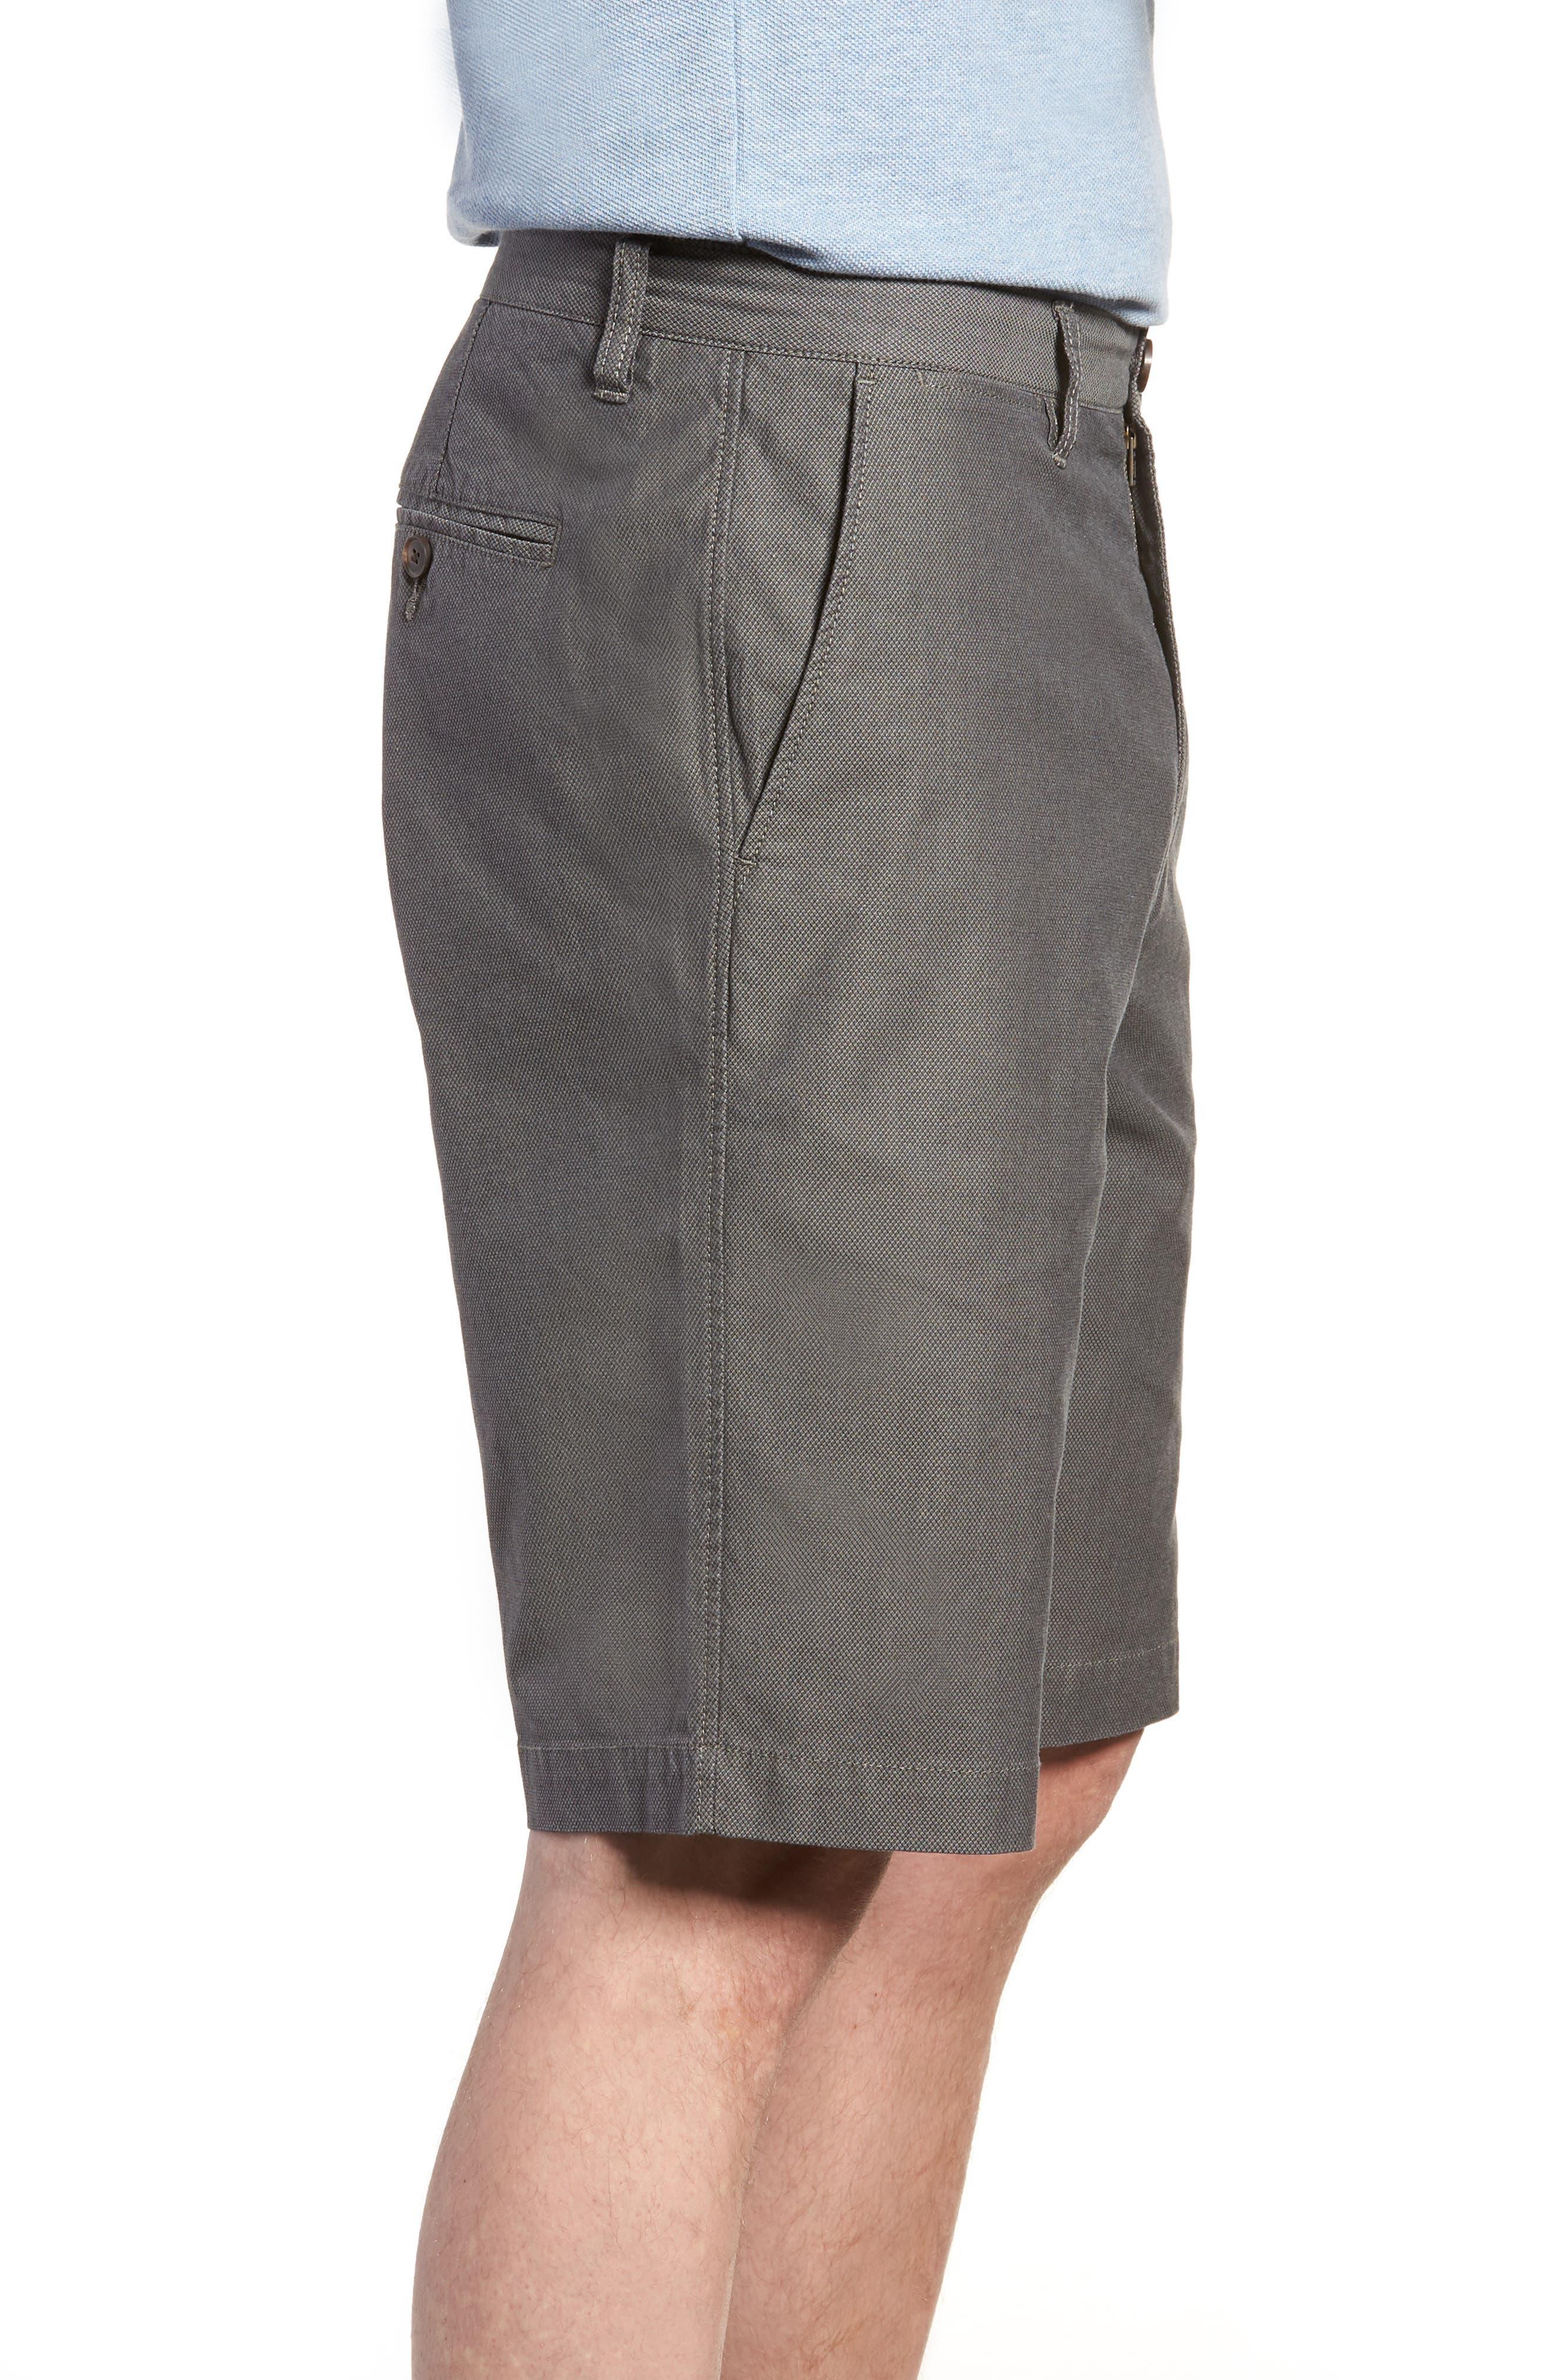 RODD & GUNN,                             Army Bay Regular Fit Shorts,                             Alternate thumbnail 3, color,                             023